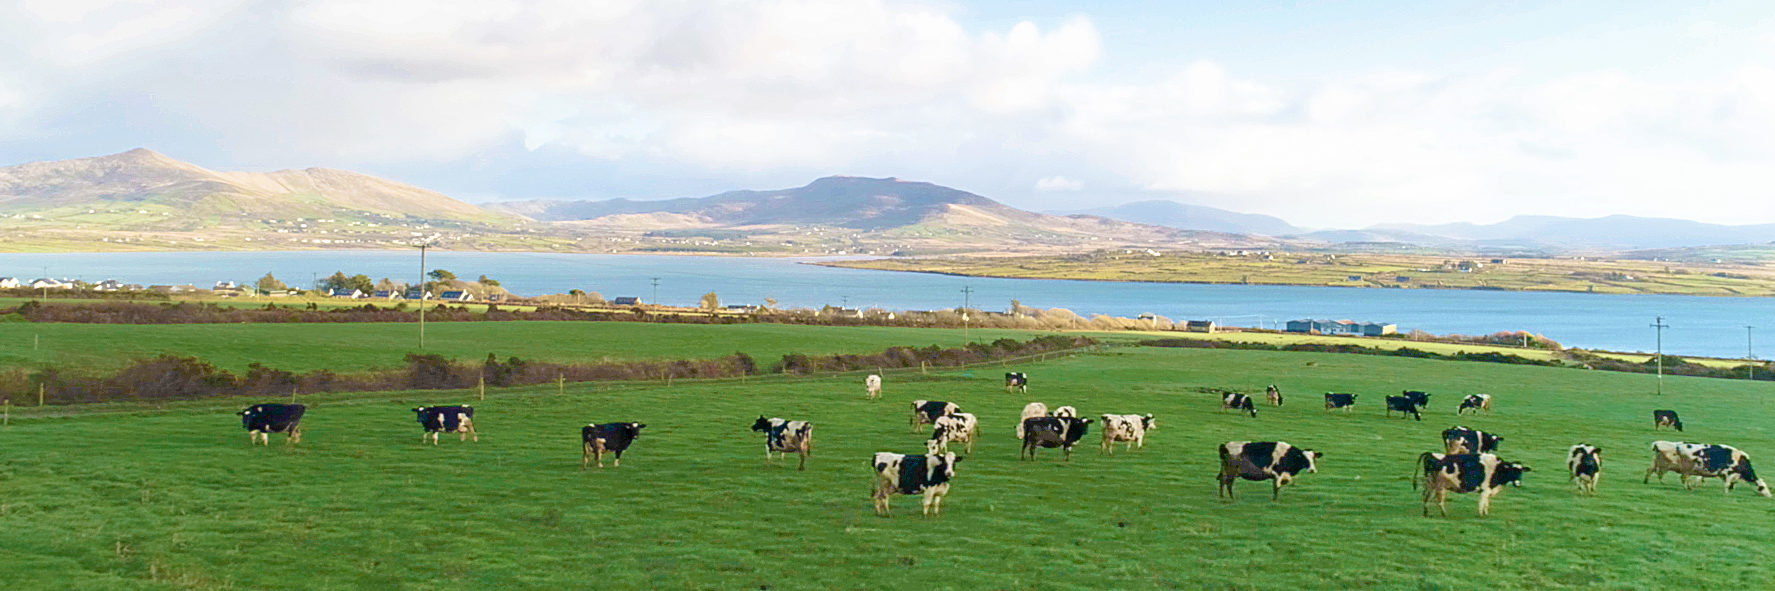 Traditional Dairy Farm Kerry | Daly's Farm Valentia | Valentia Ice Cream